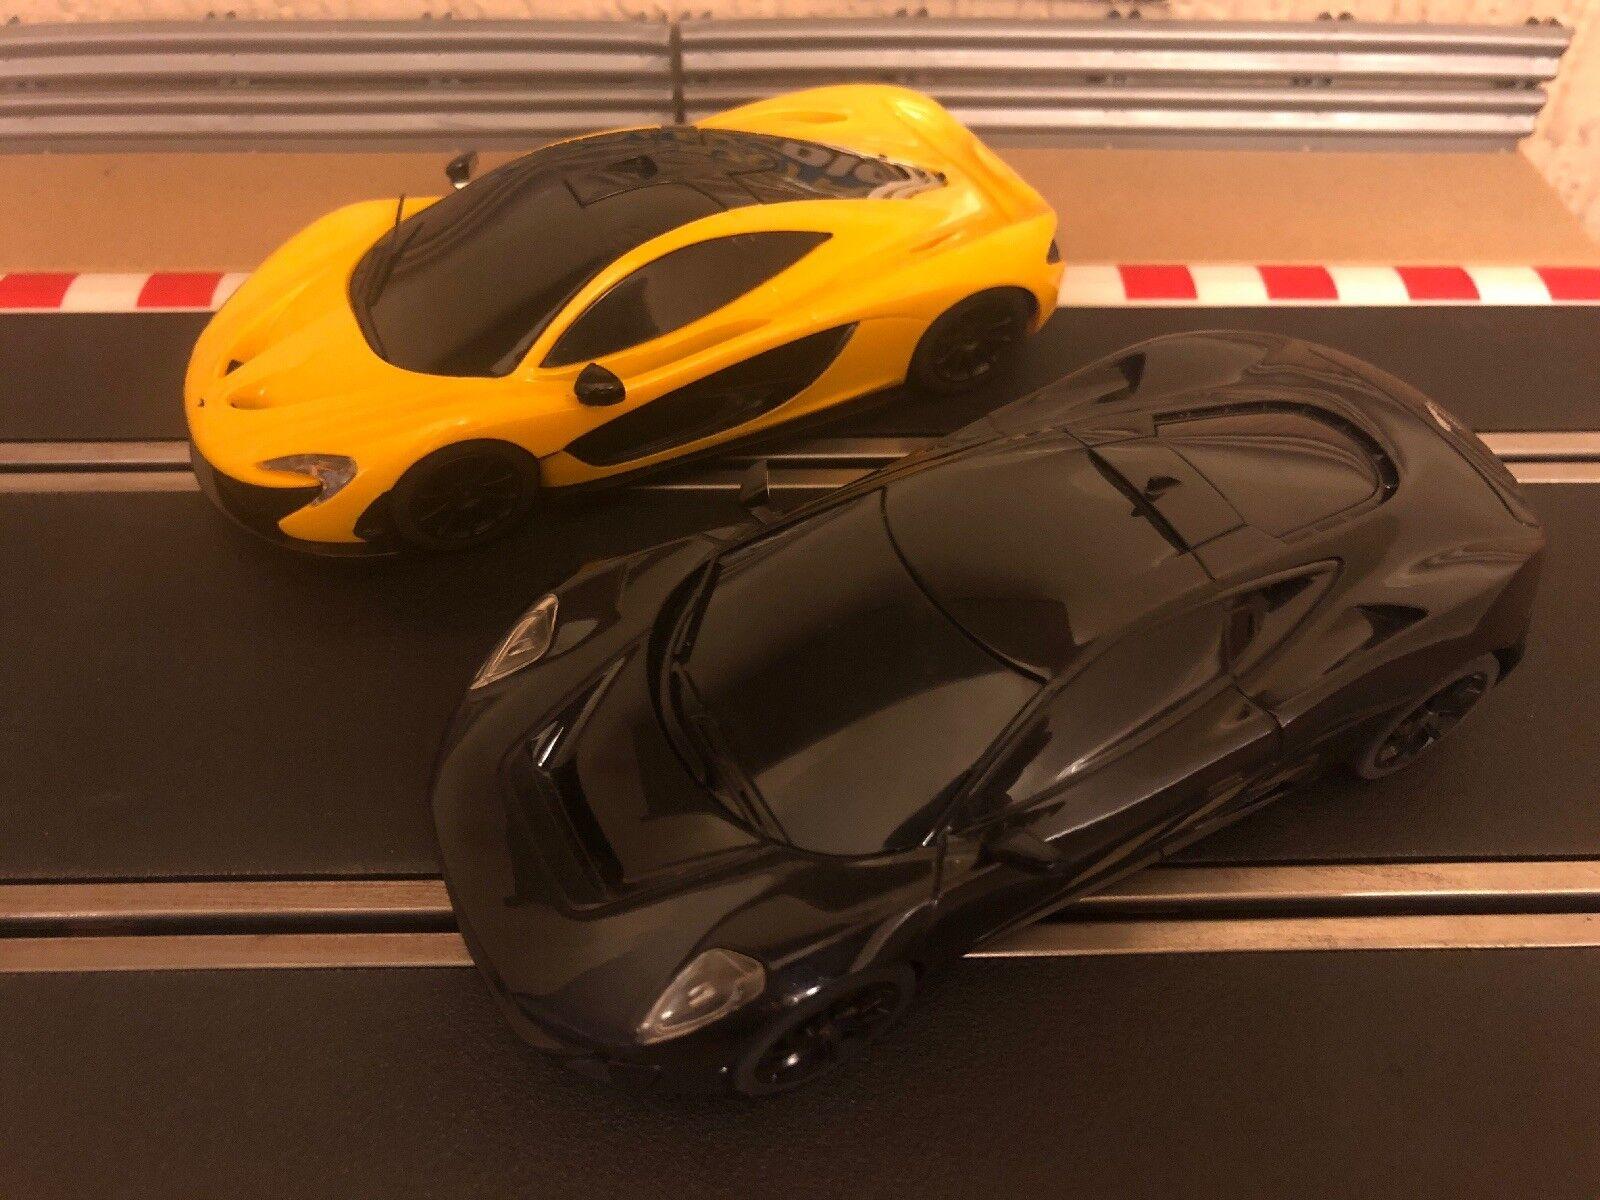 Scalextric Digital McLaren P1 & Jaguar C-X75 nuevo, sin usar completamente reparado